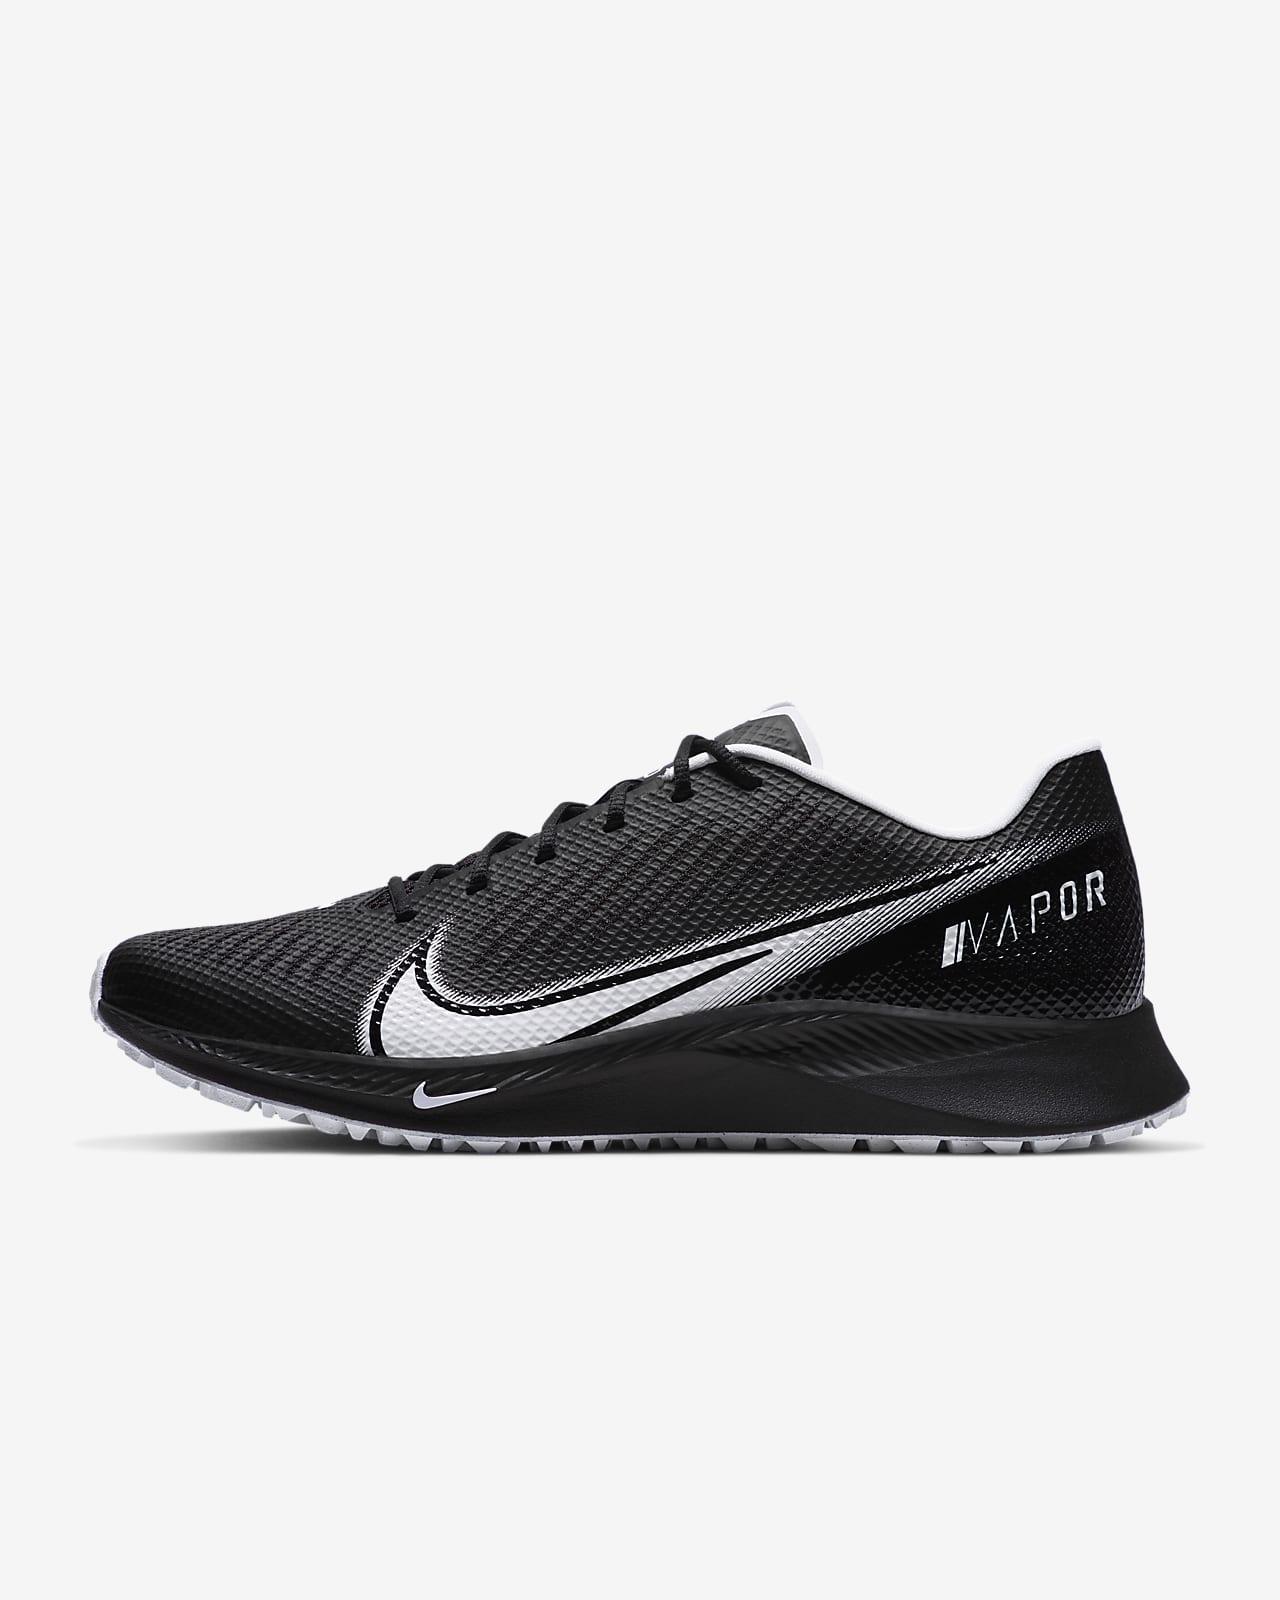 chaussure nike vapor